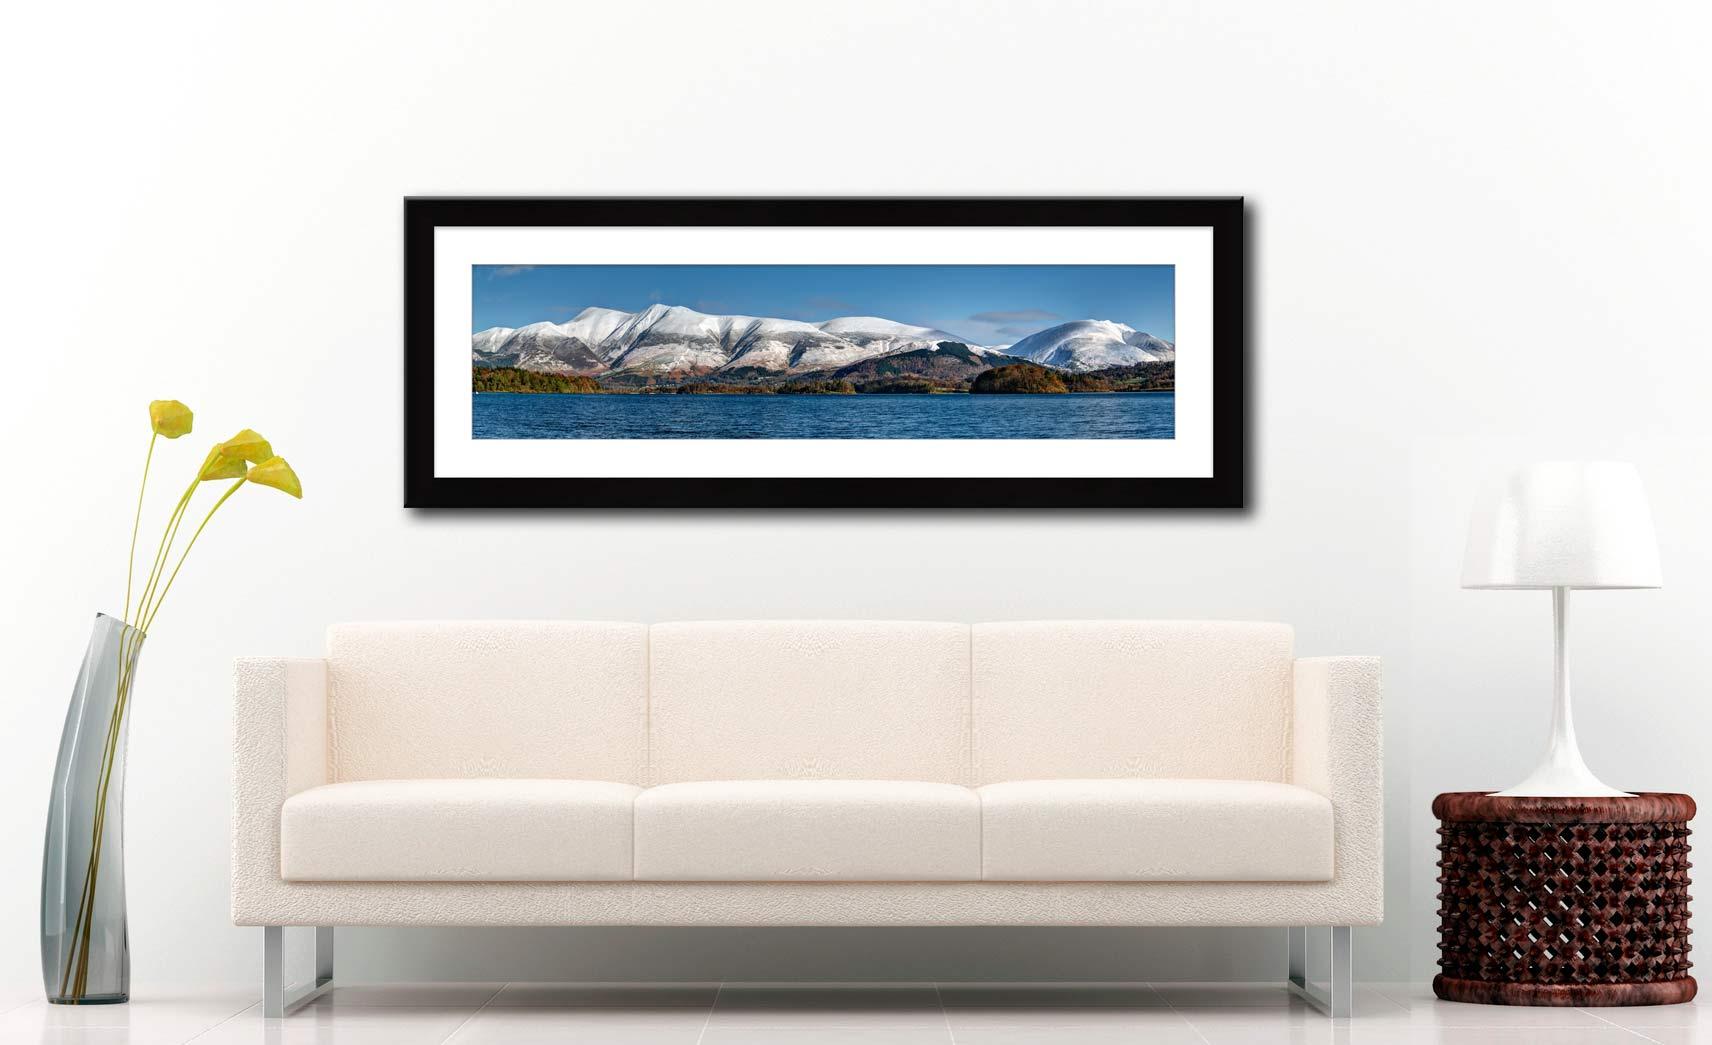 Skiddaw and Saddleback - Framed Print with Mount on Wall